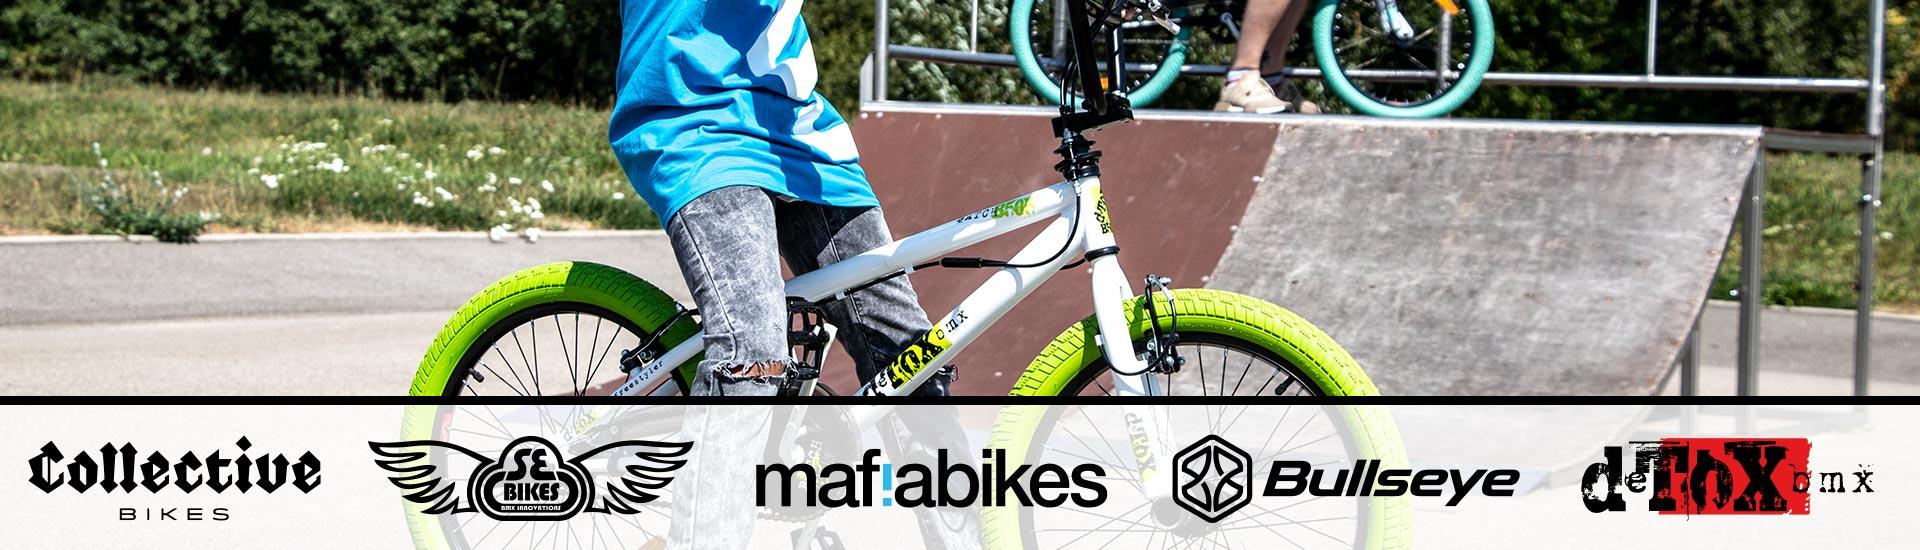 Große BMX Auswahl - Markenvielfalt mafiabikes - Collective Bikes - deTox - SE Bikes